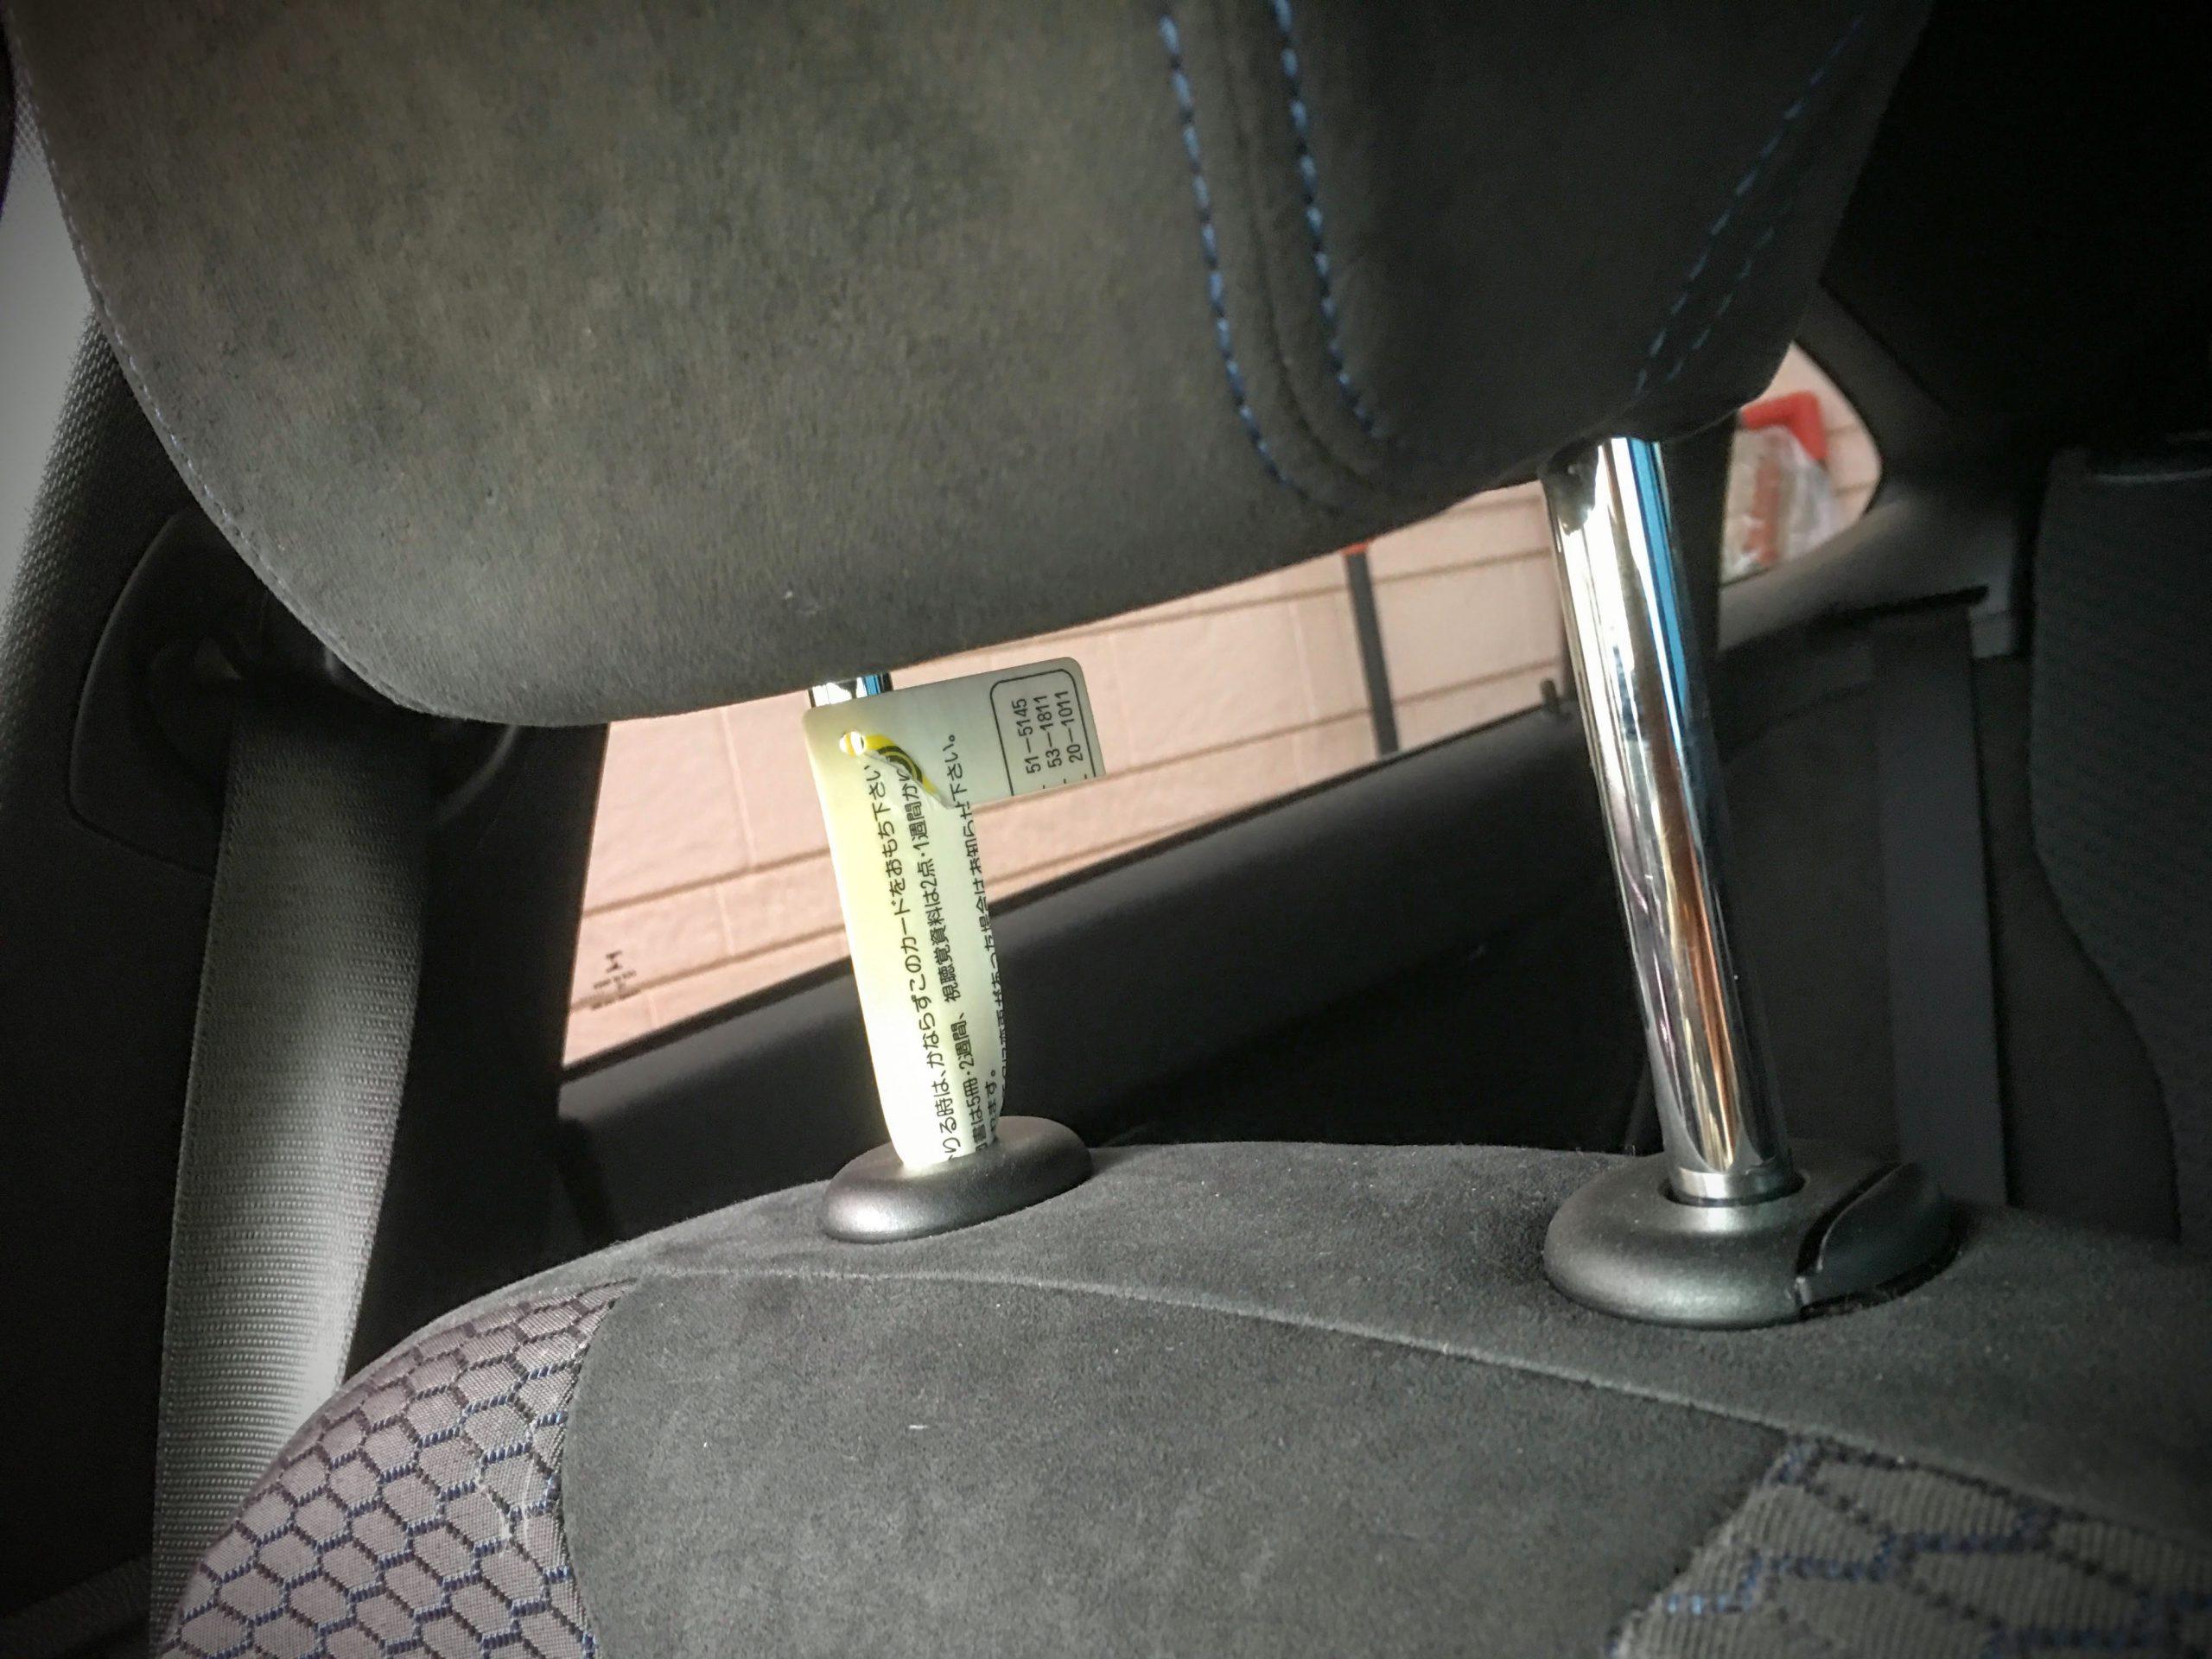 BMWのヘッドレストを隙間なく一番下まで下げる方法【BMW4シリーズグランクーペ】